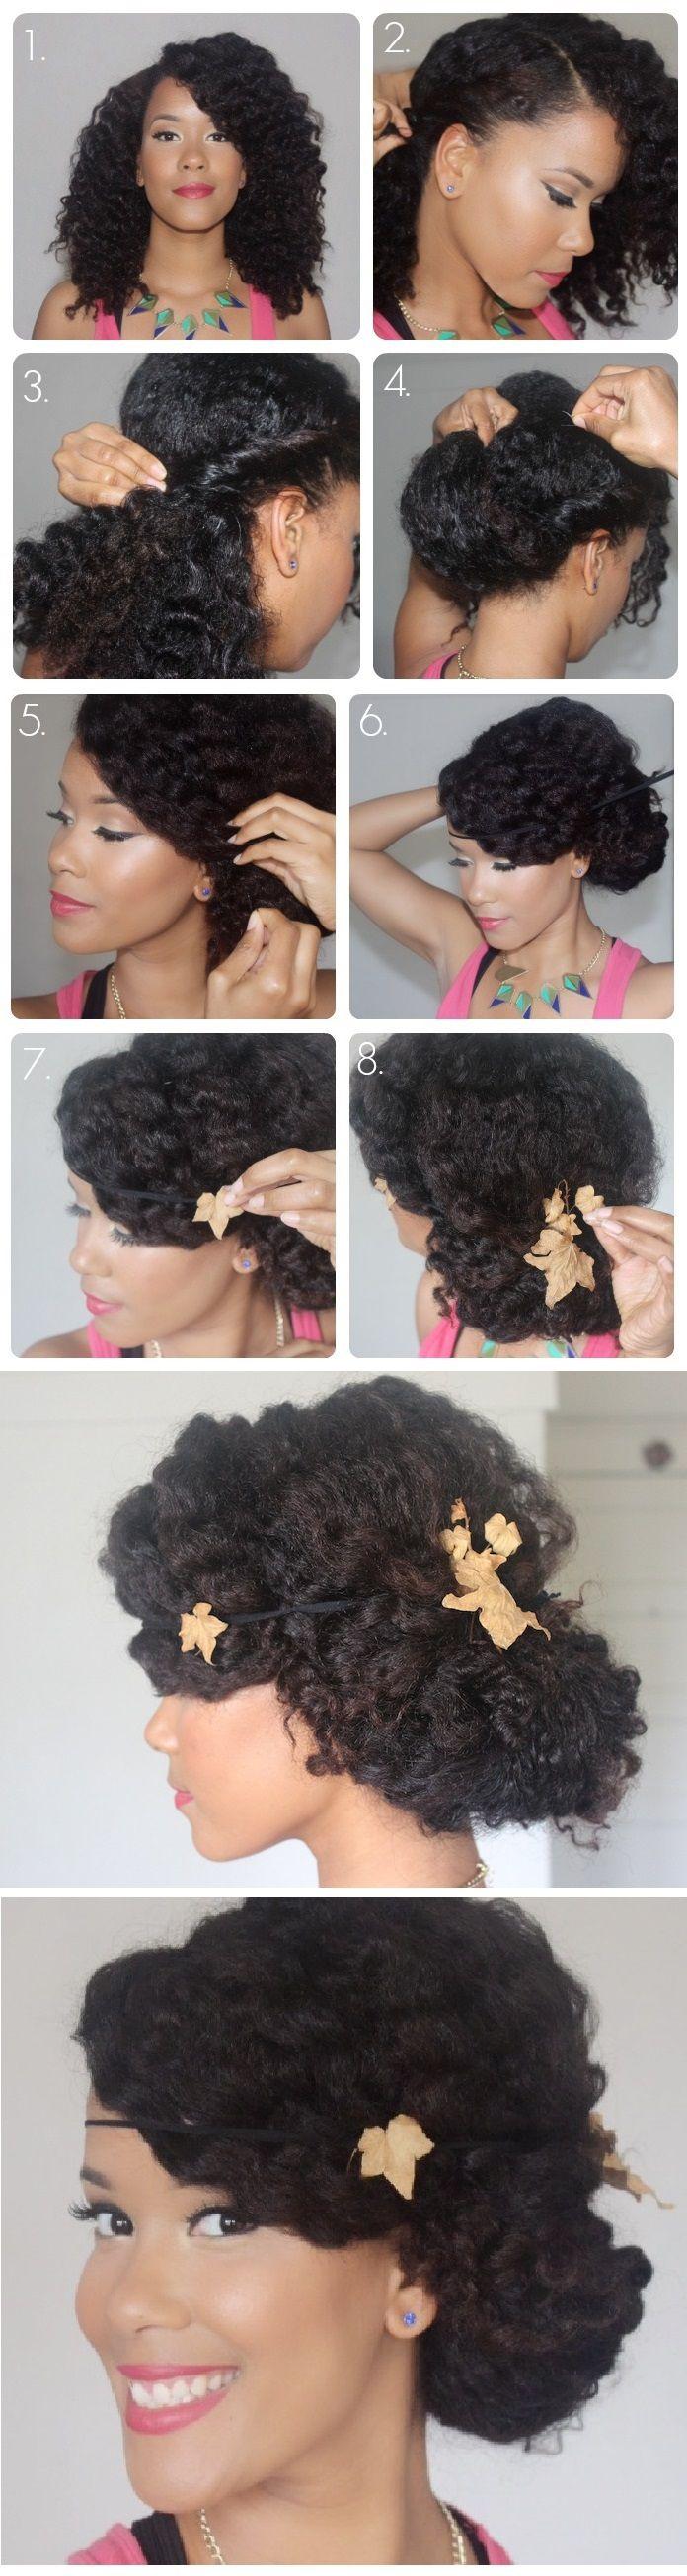 http://www.shorthaircutsforblackwomen.com/black-tea-rinse-for-hair/ Natural Hair Spring Fling: Wavy, Low Chignon Pictorial